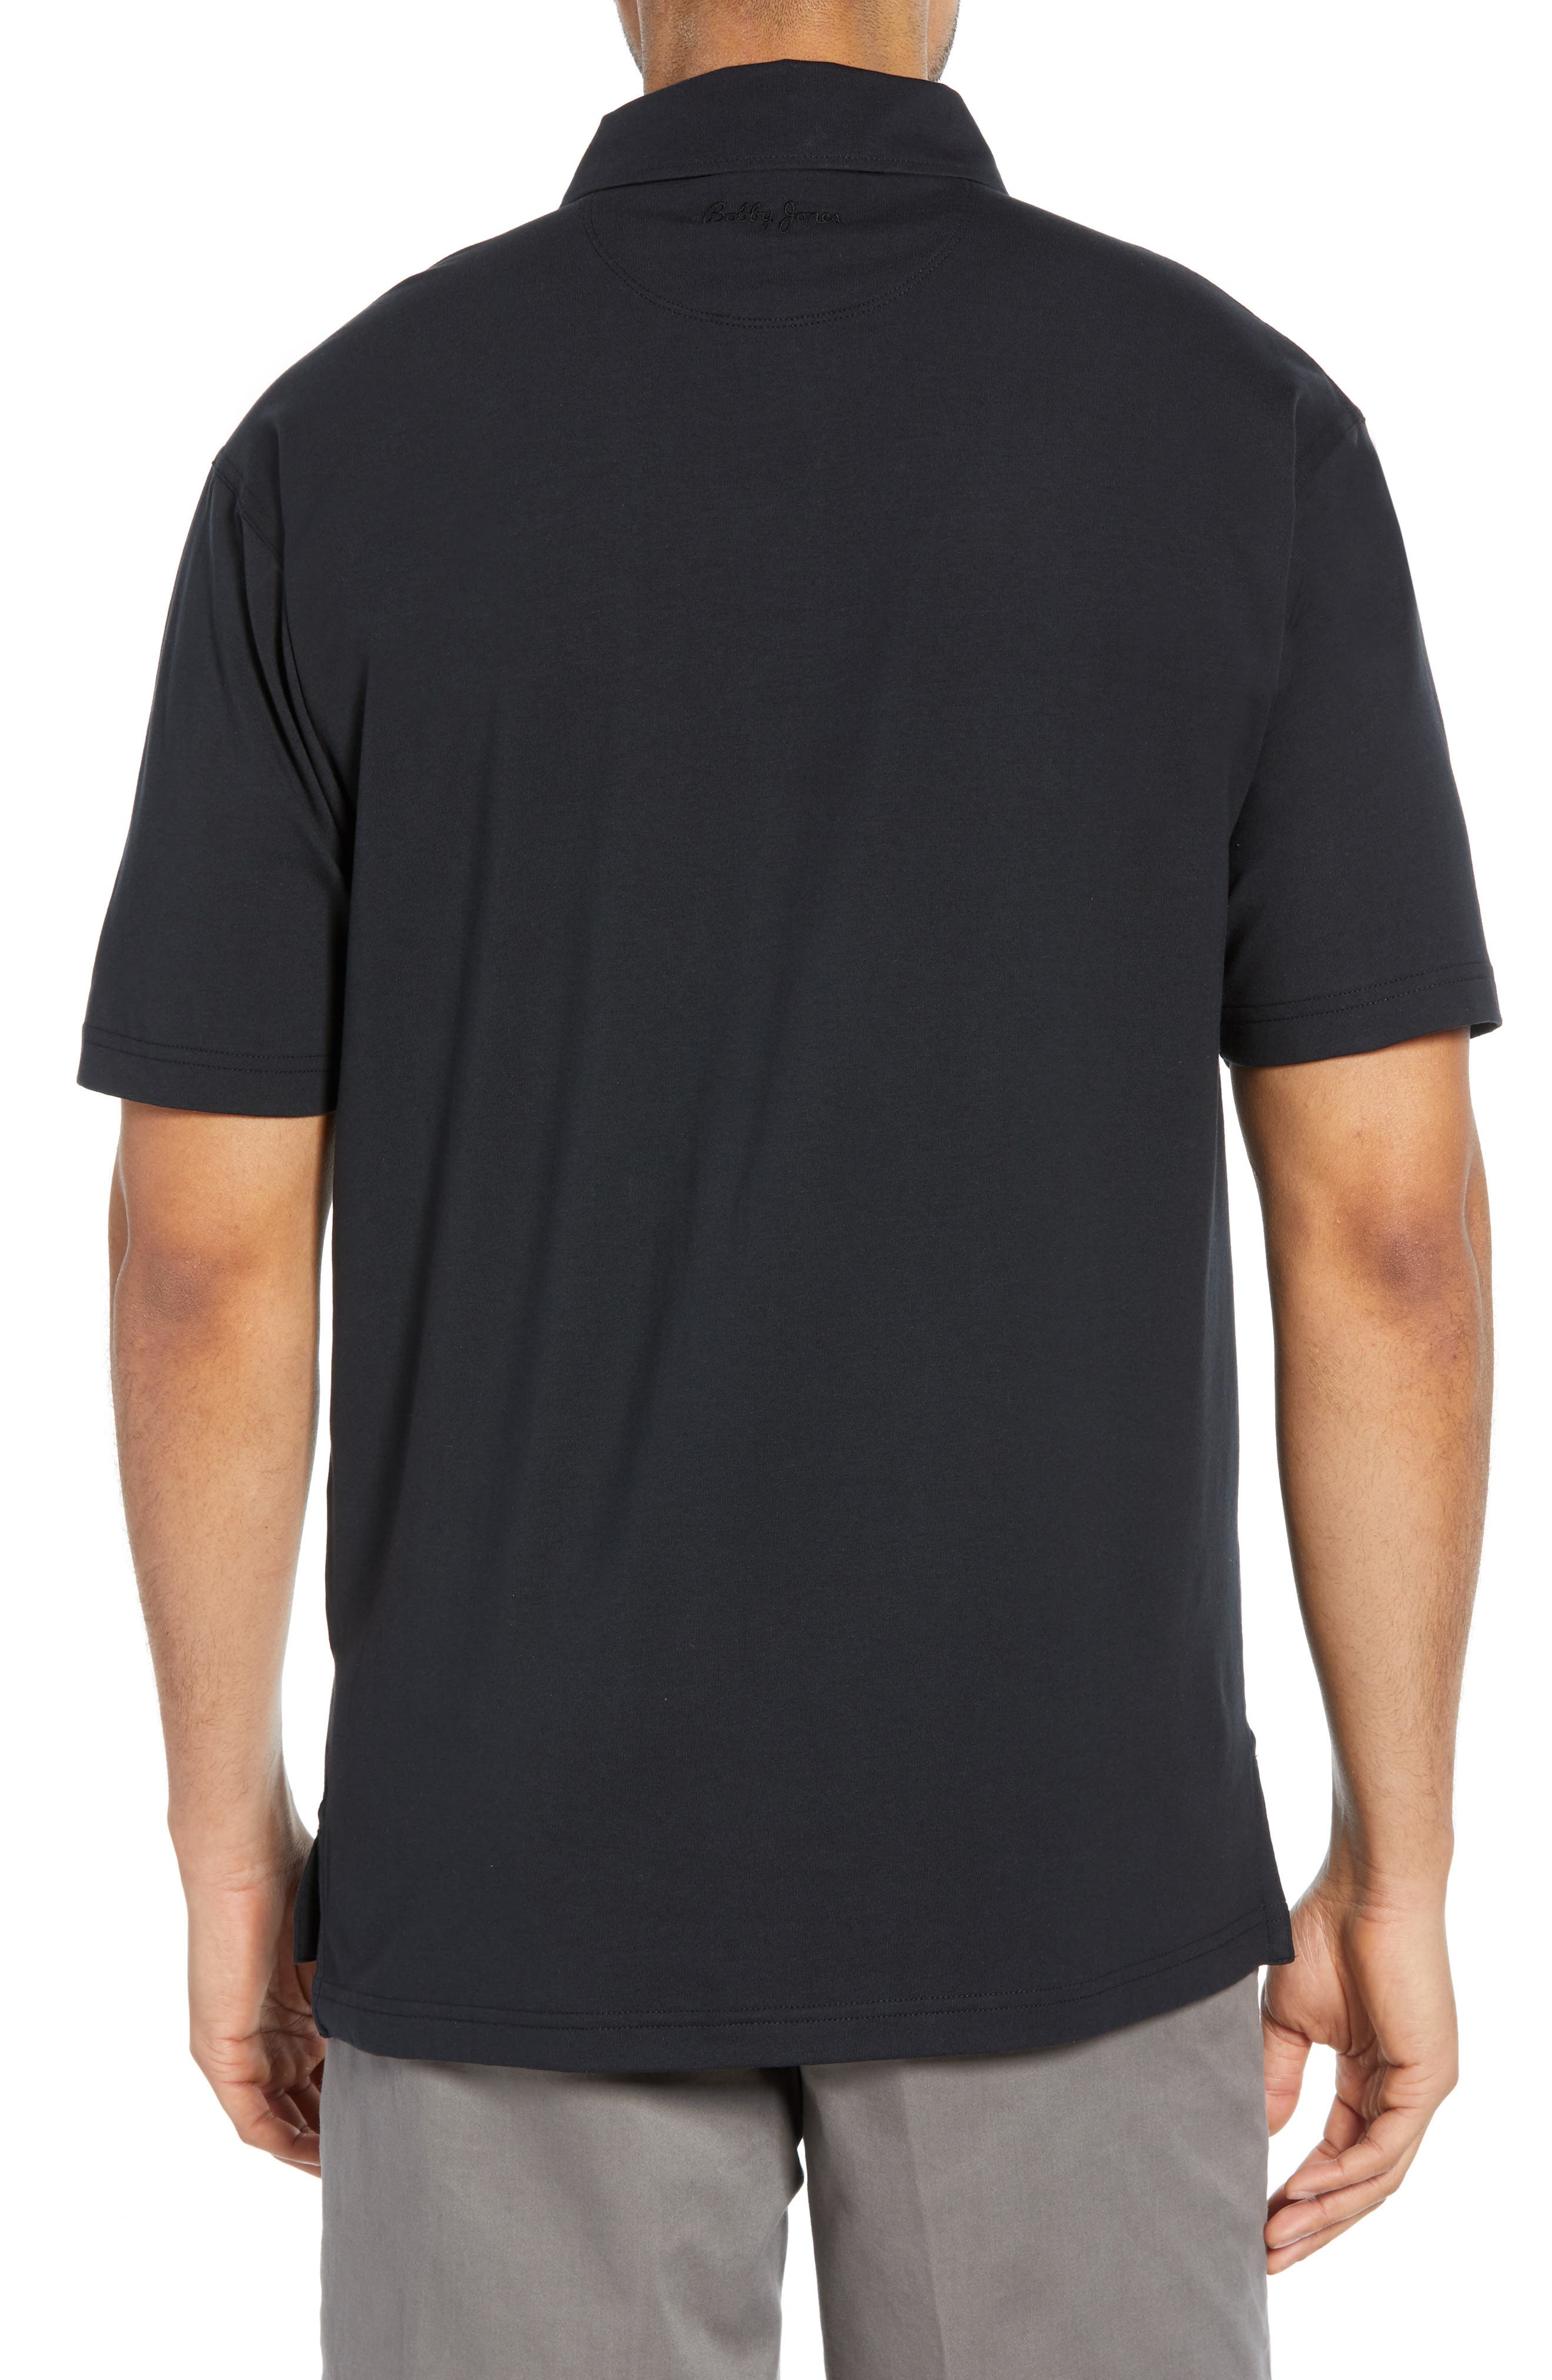 BOBBY JONES,                             Liquid Cotton Stretch Jersey Polo,                             Alternate thumbnail 2, color,                             BLACK